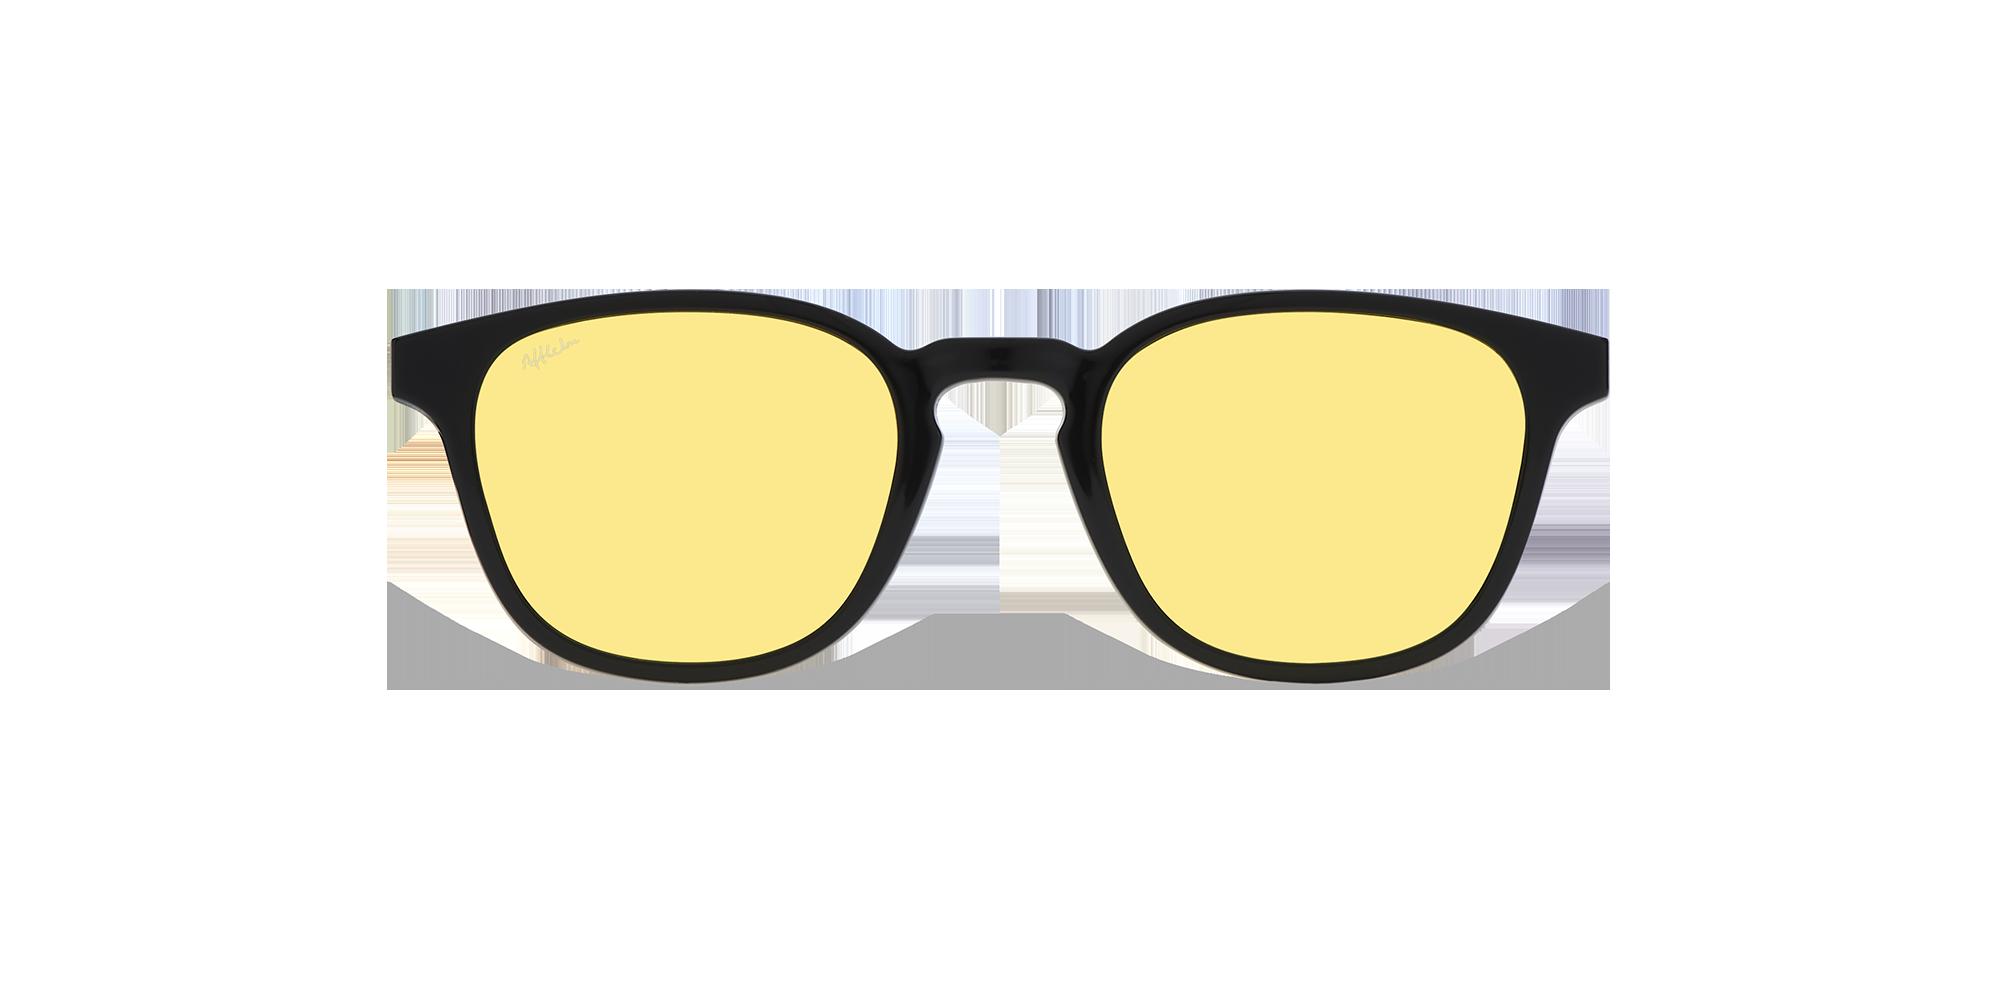 afflelou/france/products/smart_clip/clips_glasses/07630036429242_face.png